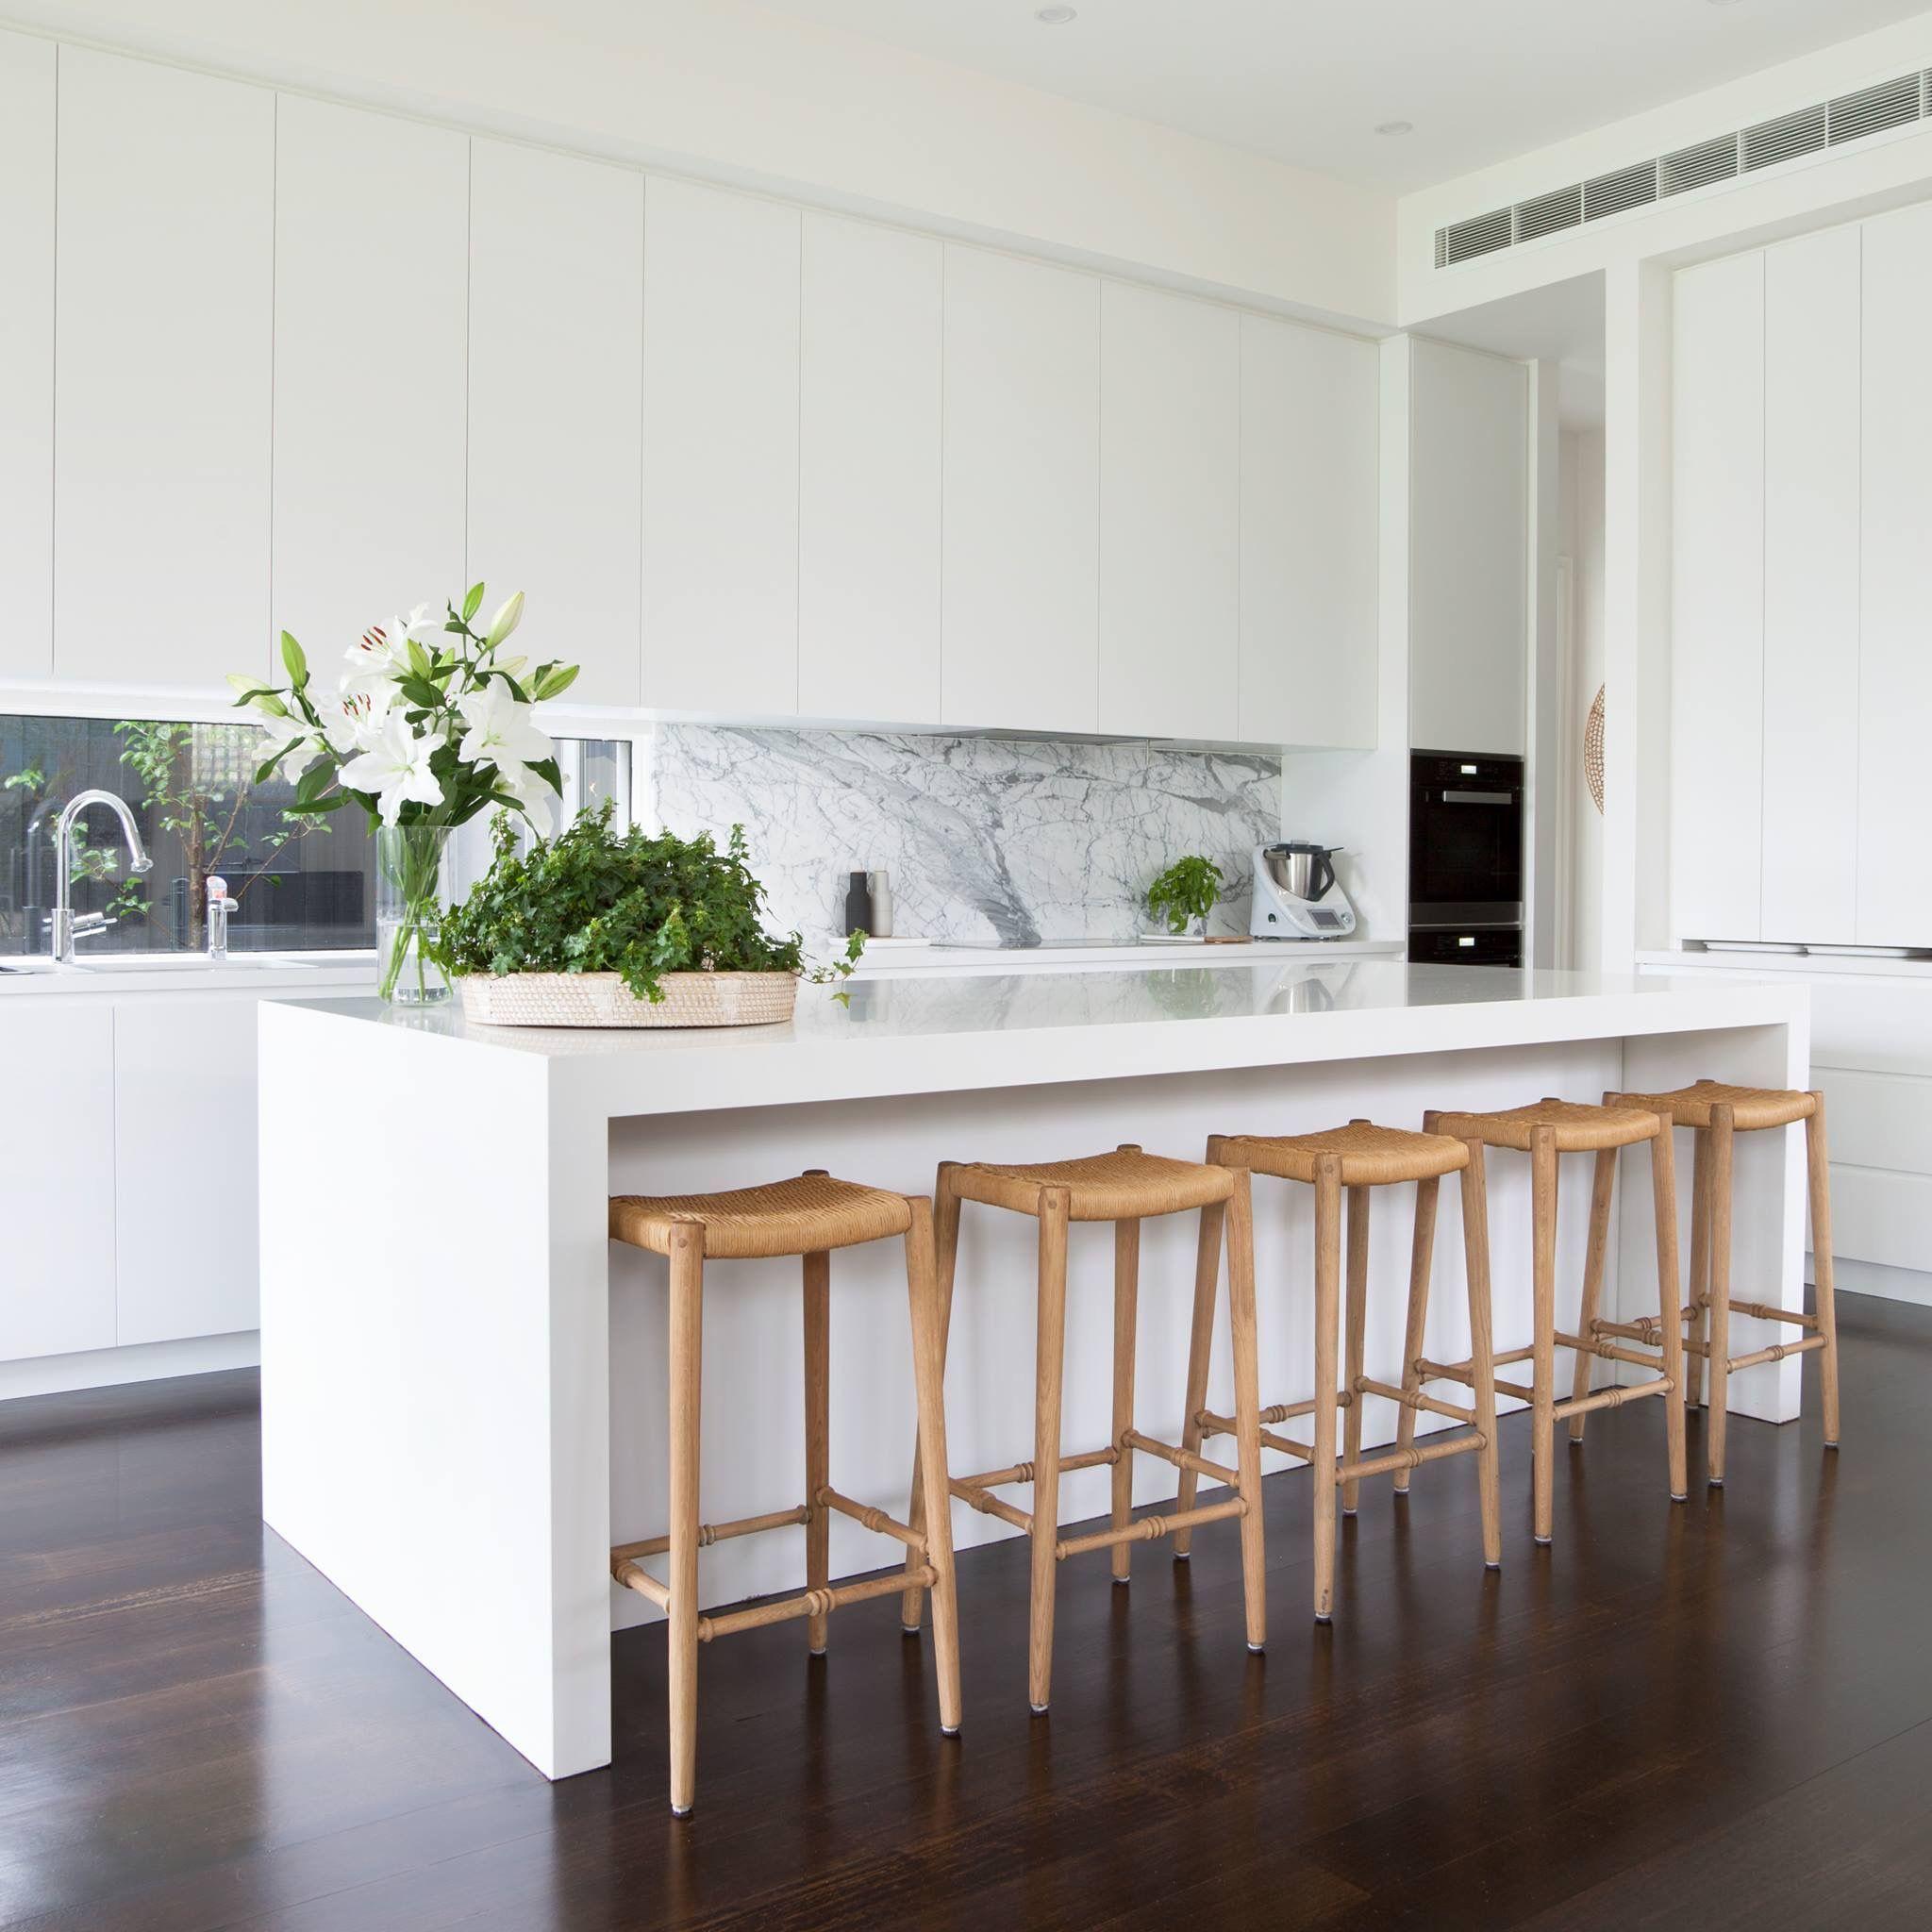 European Style Kitchen Remodeling Ideas: Kitchen, Home, Home Decor